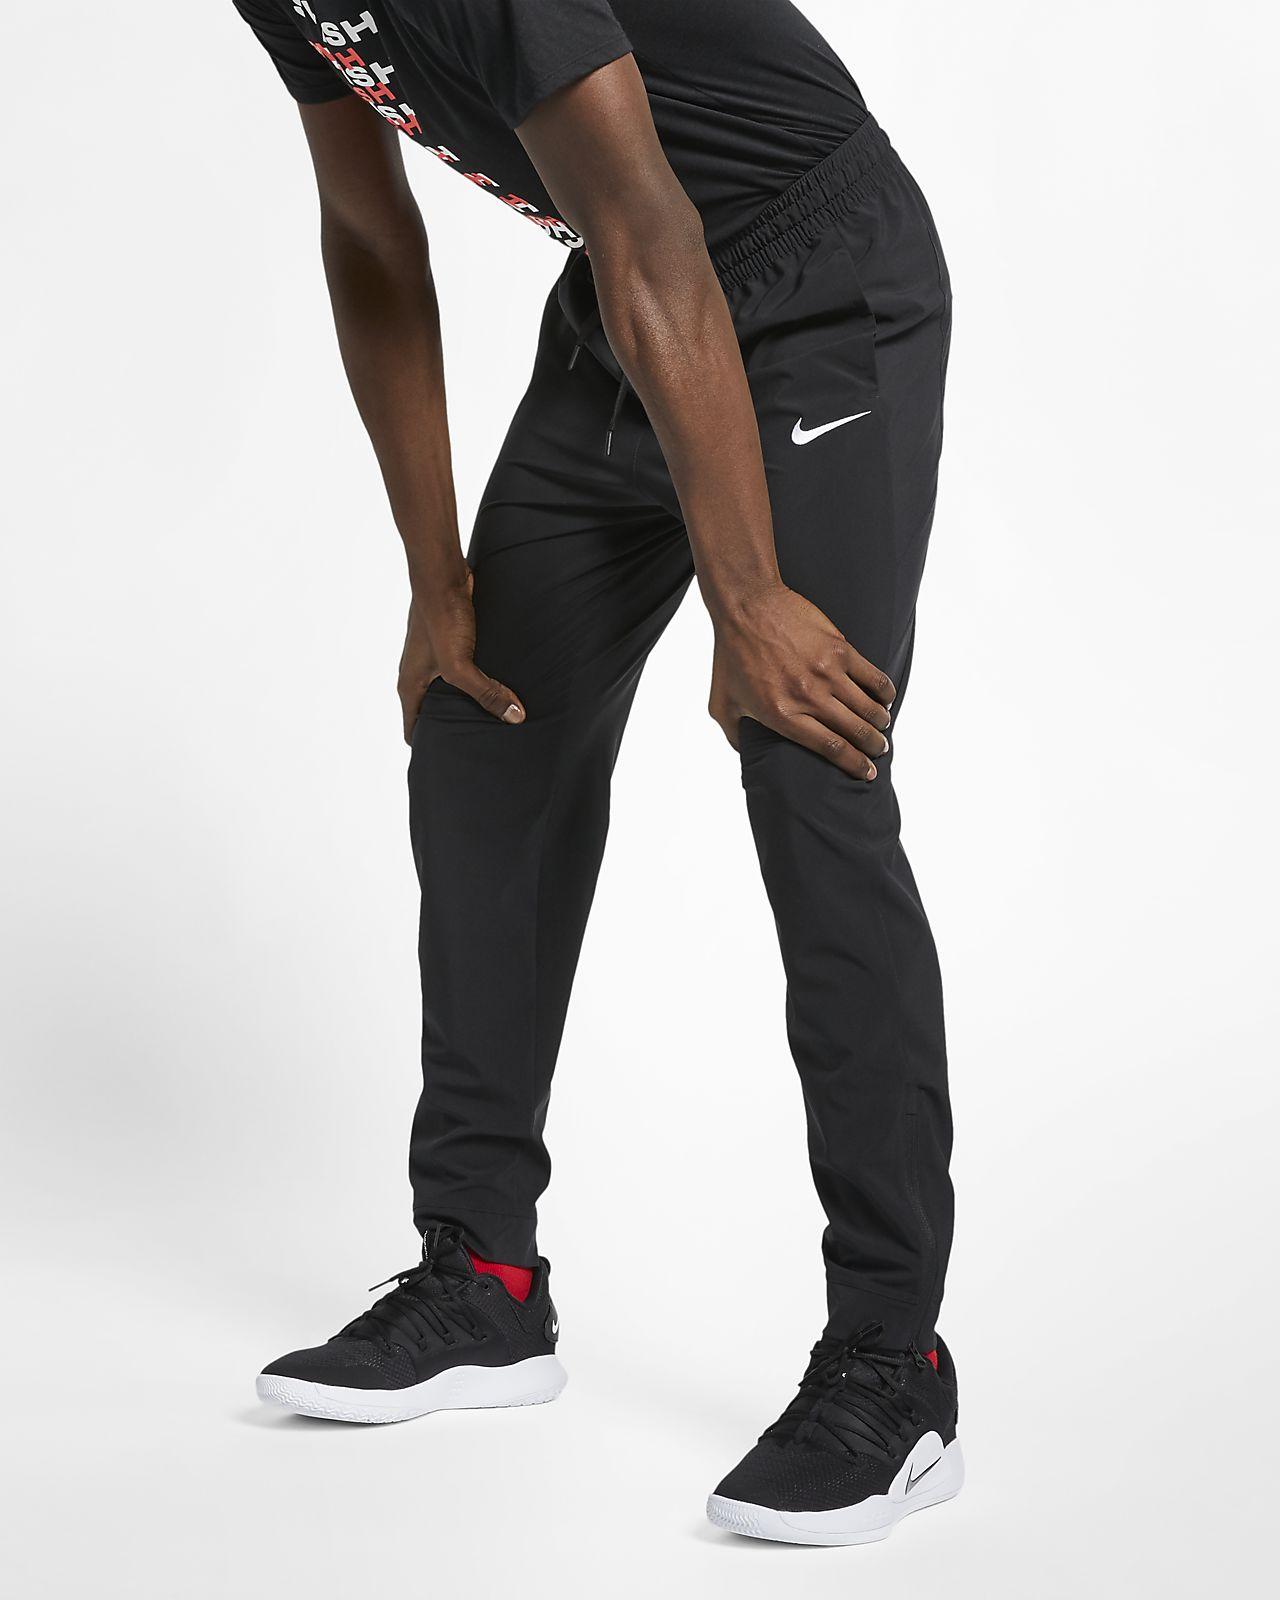 Nike 男子梭织篮球长裤